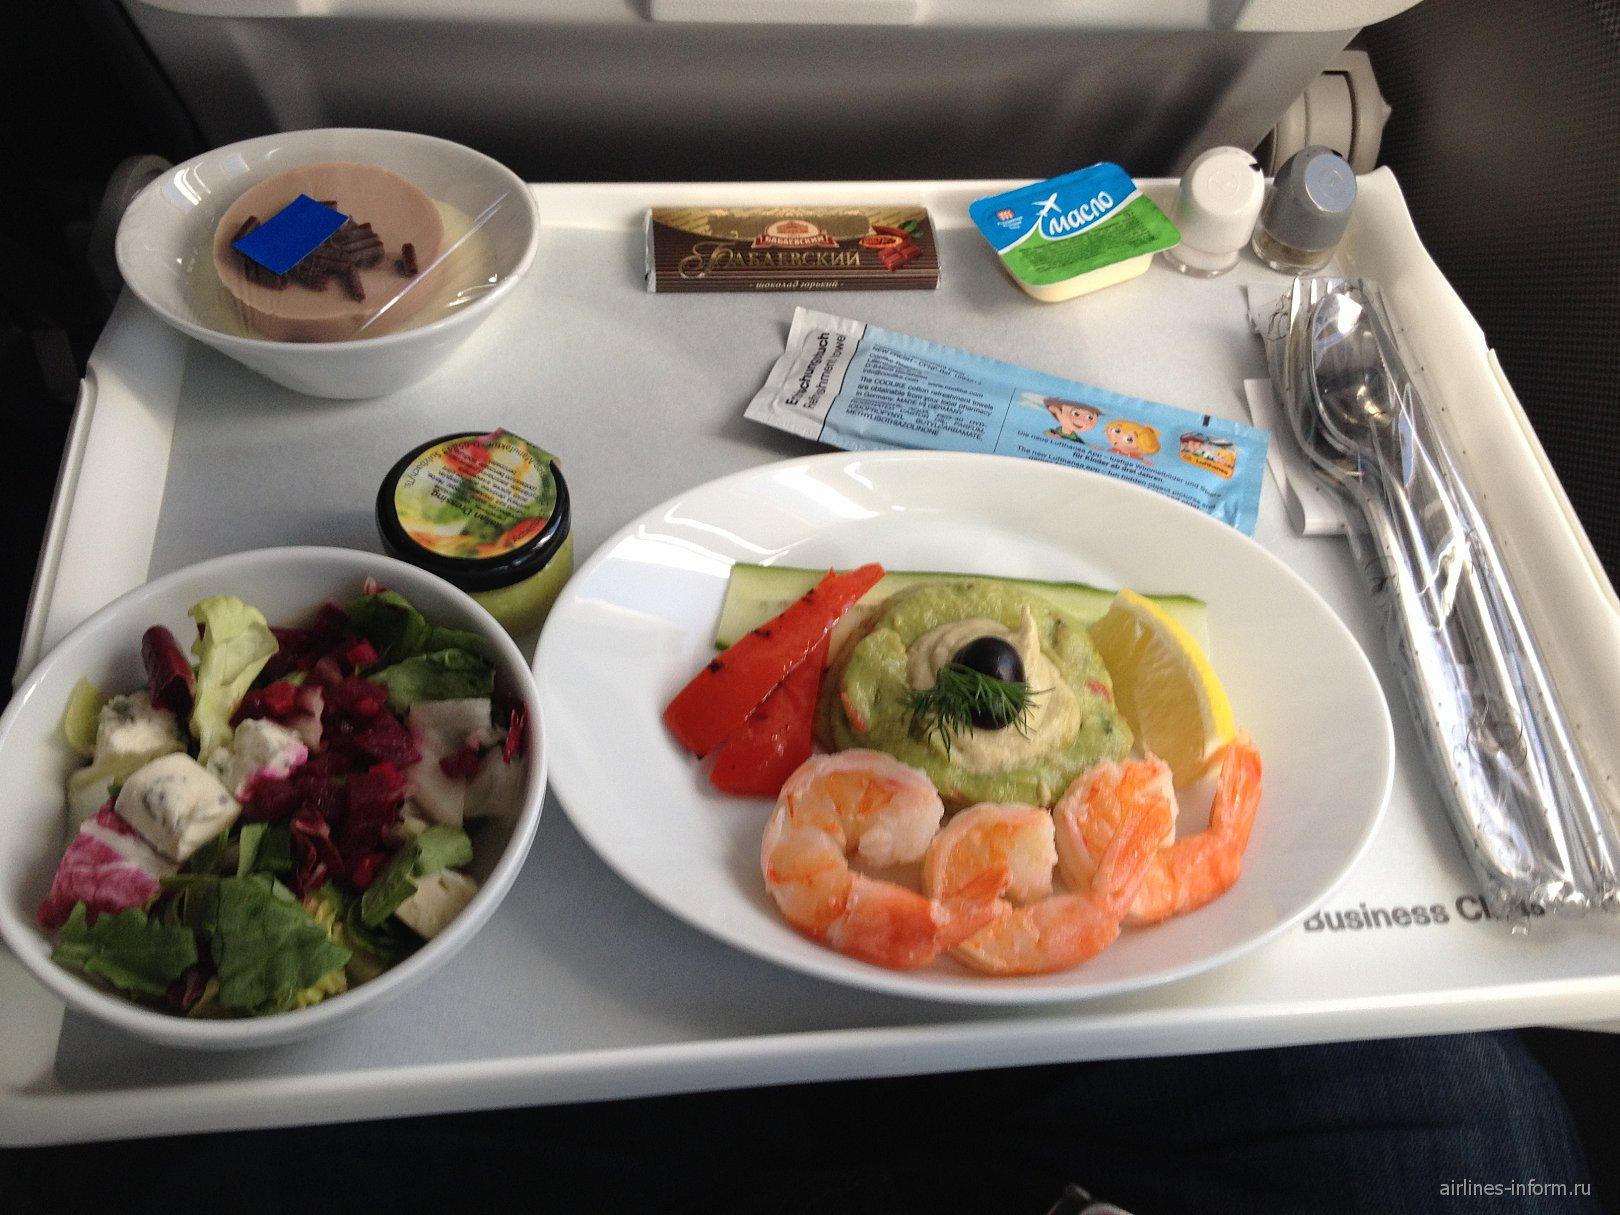 Холдные закуски в бизнес-классе авиакомпании Lufthansa на рейсе Москва-Франкфурт